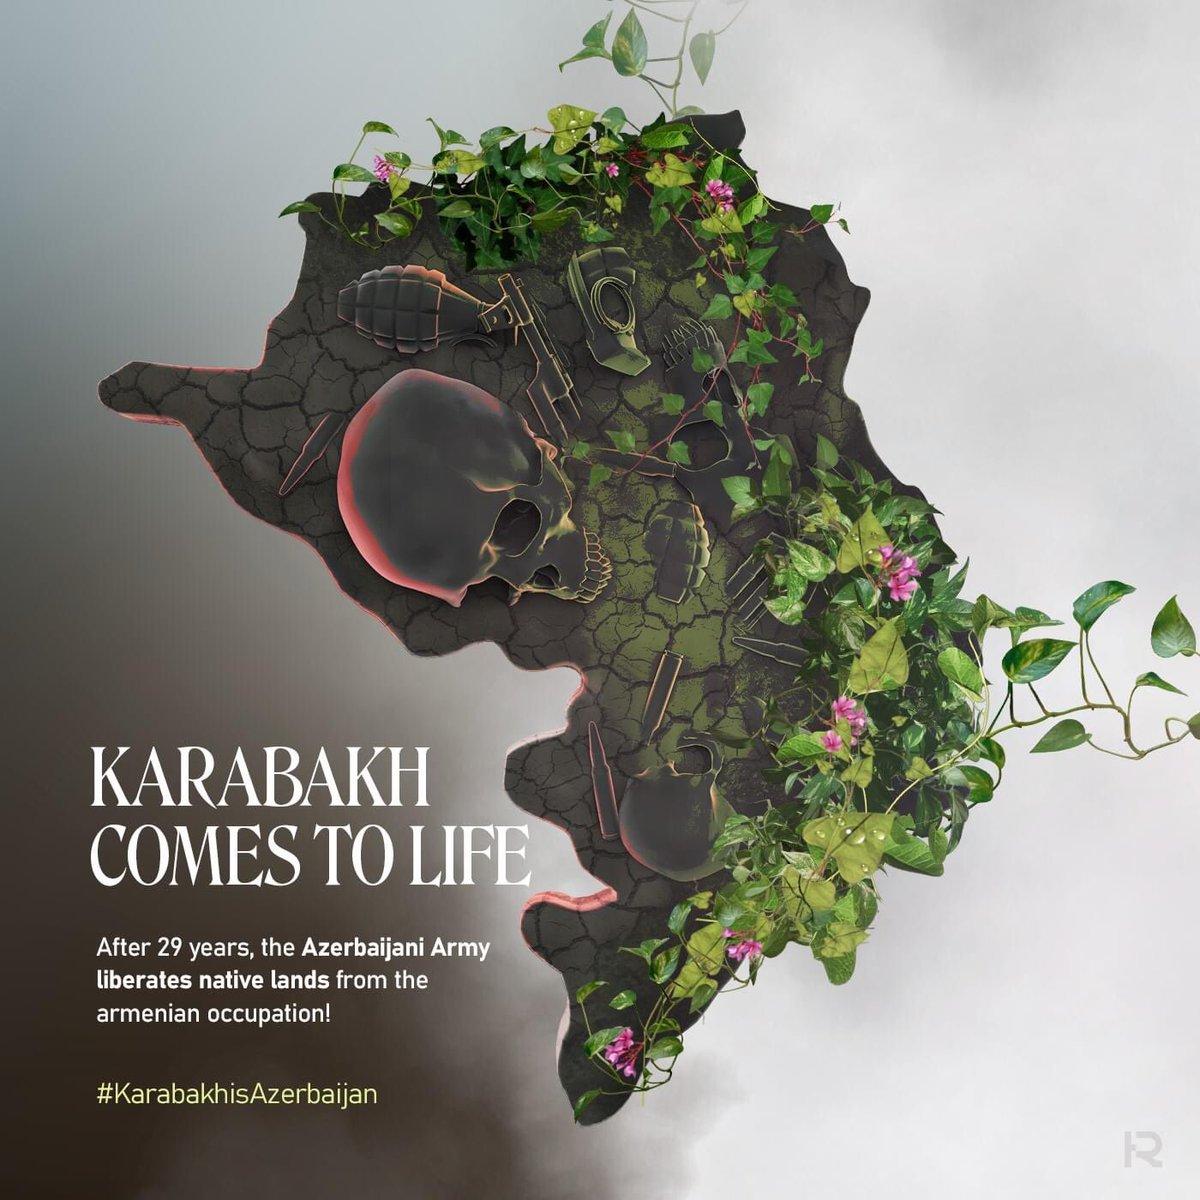 #KarabakhisAzebaijan #FocusOnKarabakh #StopArmenianOccupation #StopArmenianTerror https://t.co/8r1Mq7dxkO